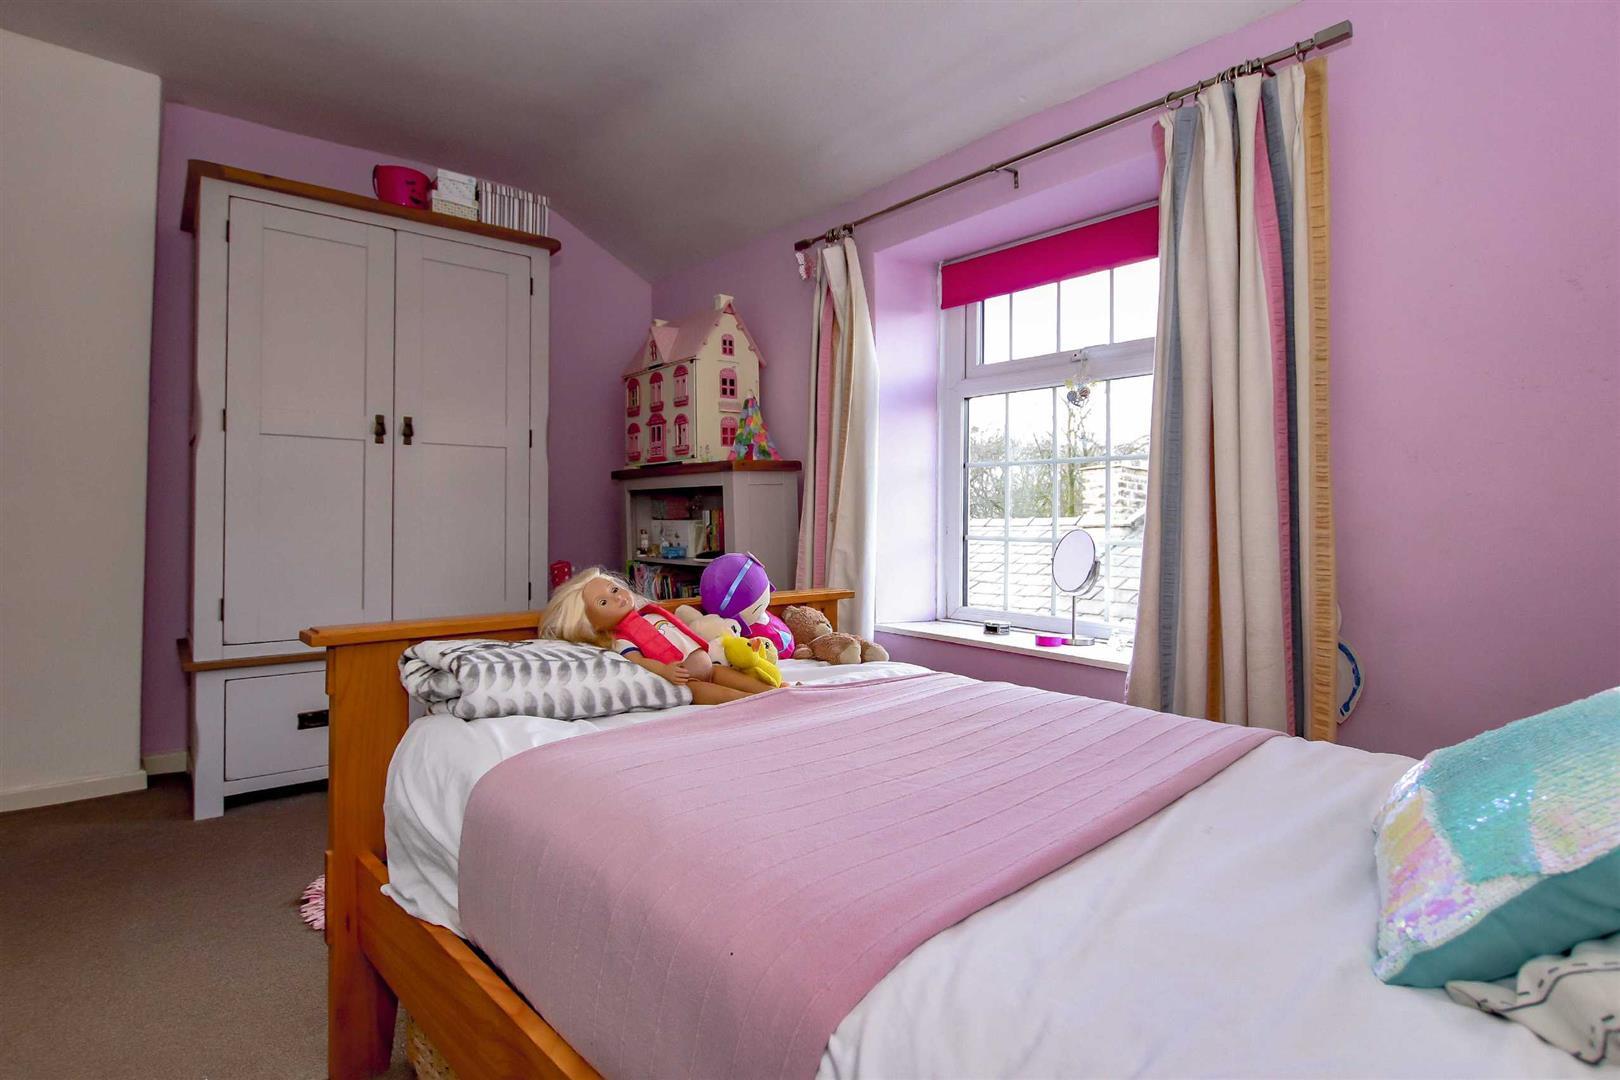 4 Bedroom Detached House For Sale - p033686_36.jpg